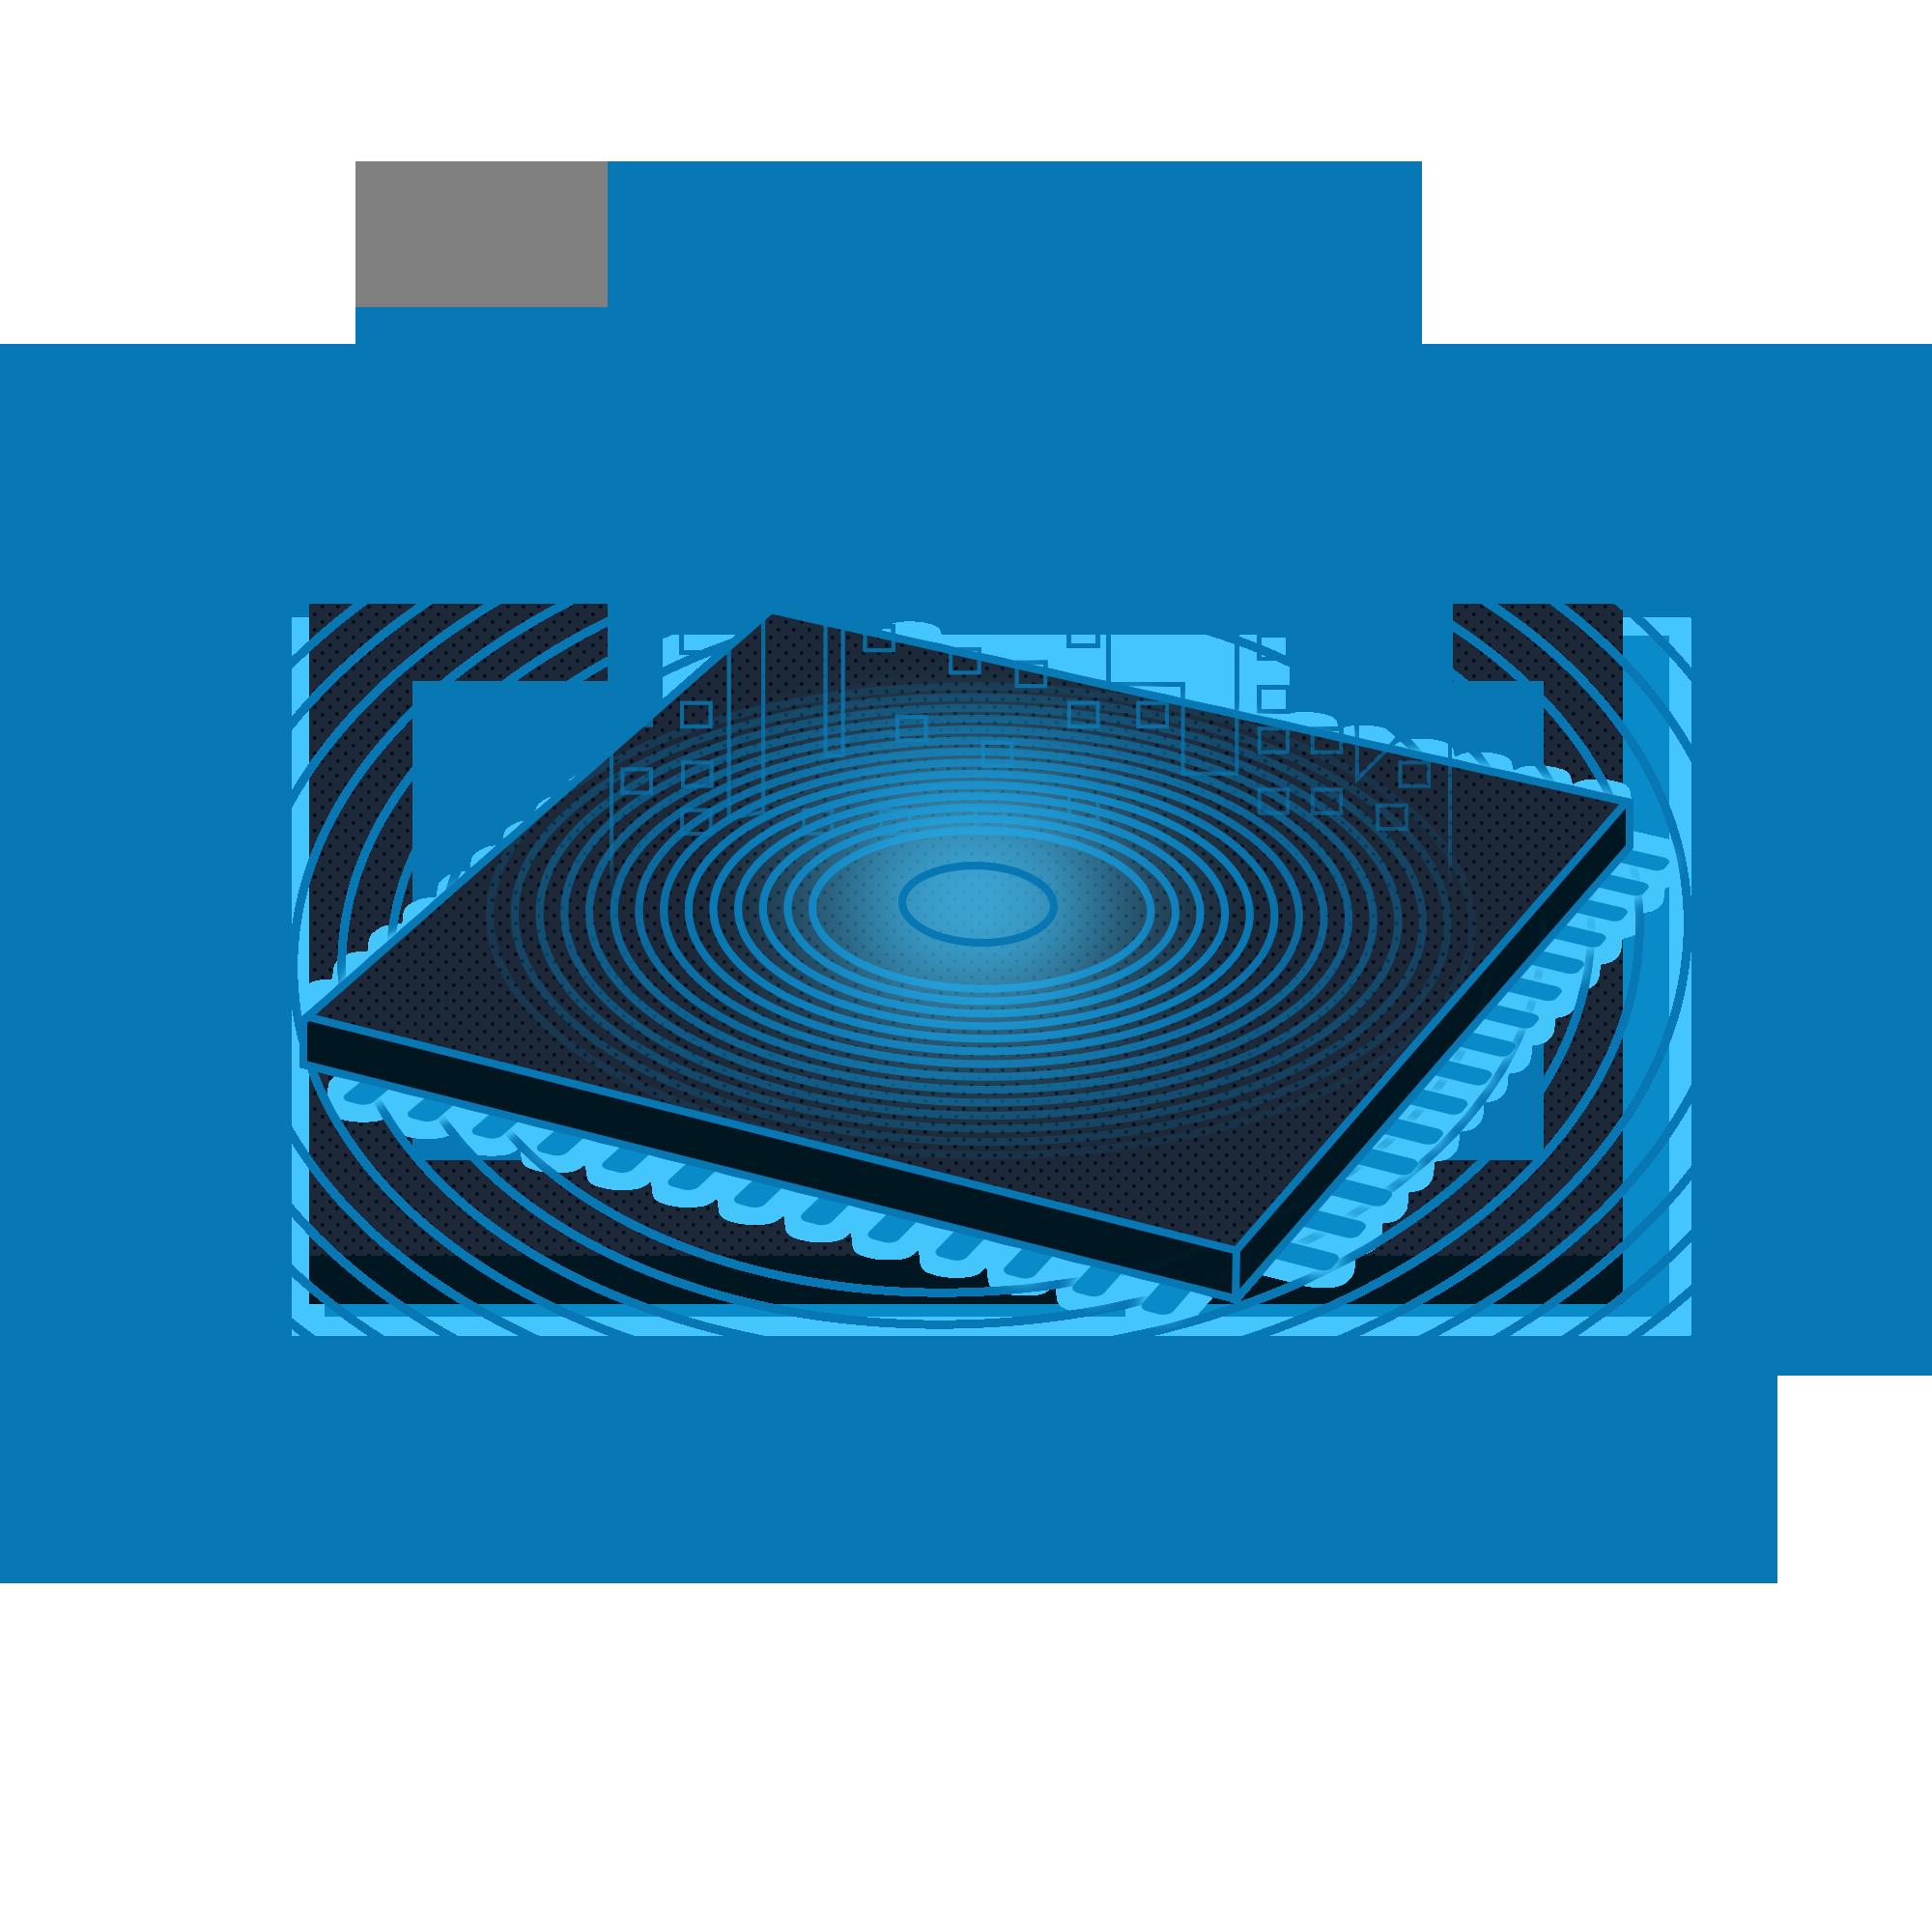 IBM Watson物联网视频课程